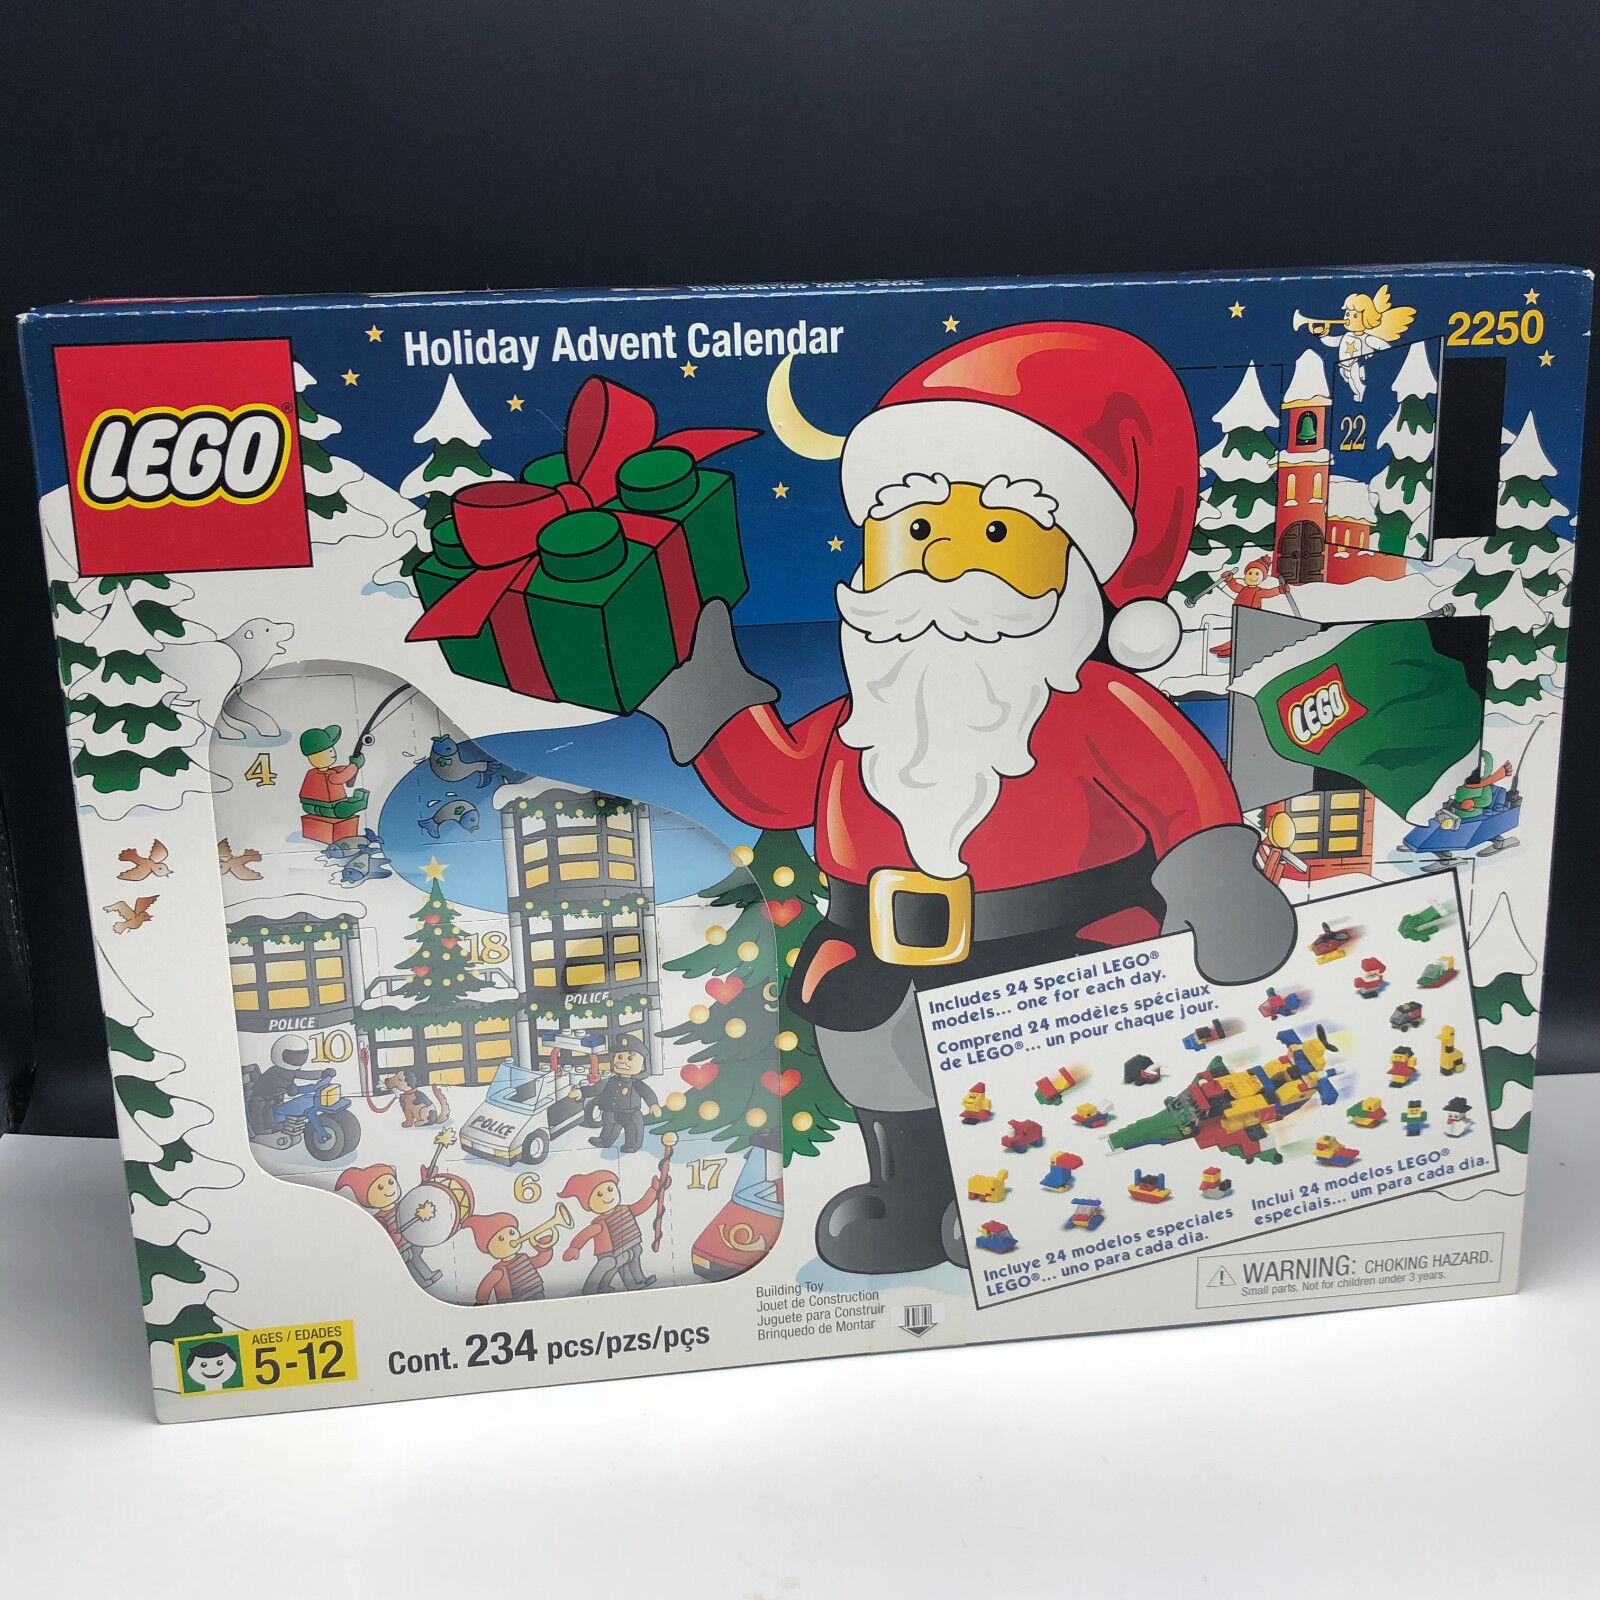 LEGO HOLIDAY ADVENT CALENDAR 2000 CHRISTMAS NEW SEALED 2250 nib box 234 set xmas